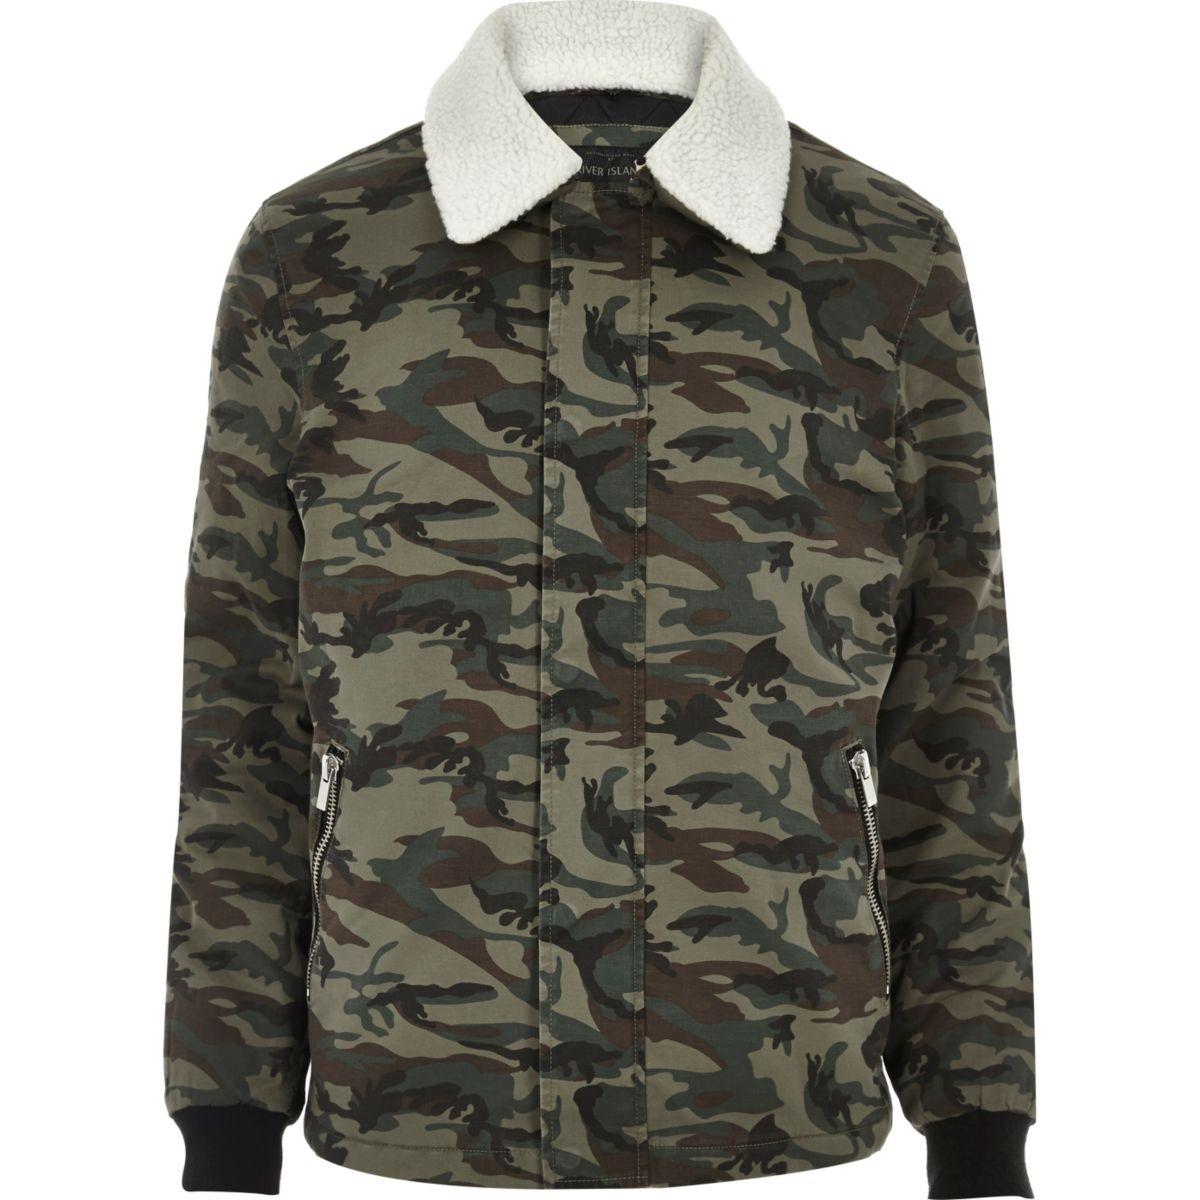 Khaki camo fleece collar jacket